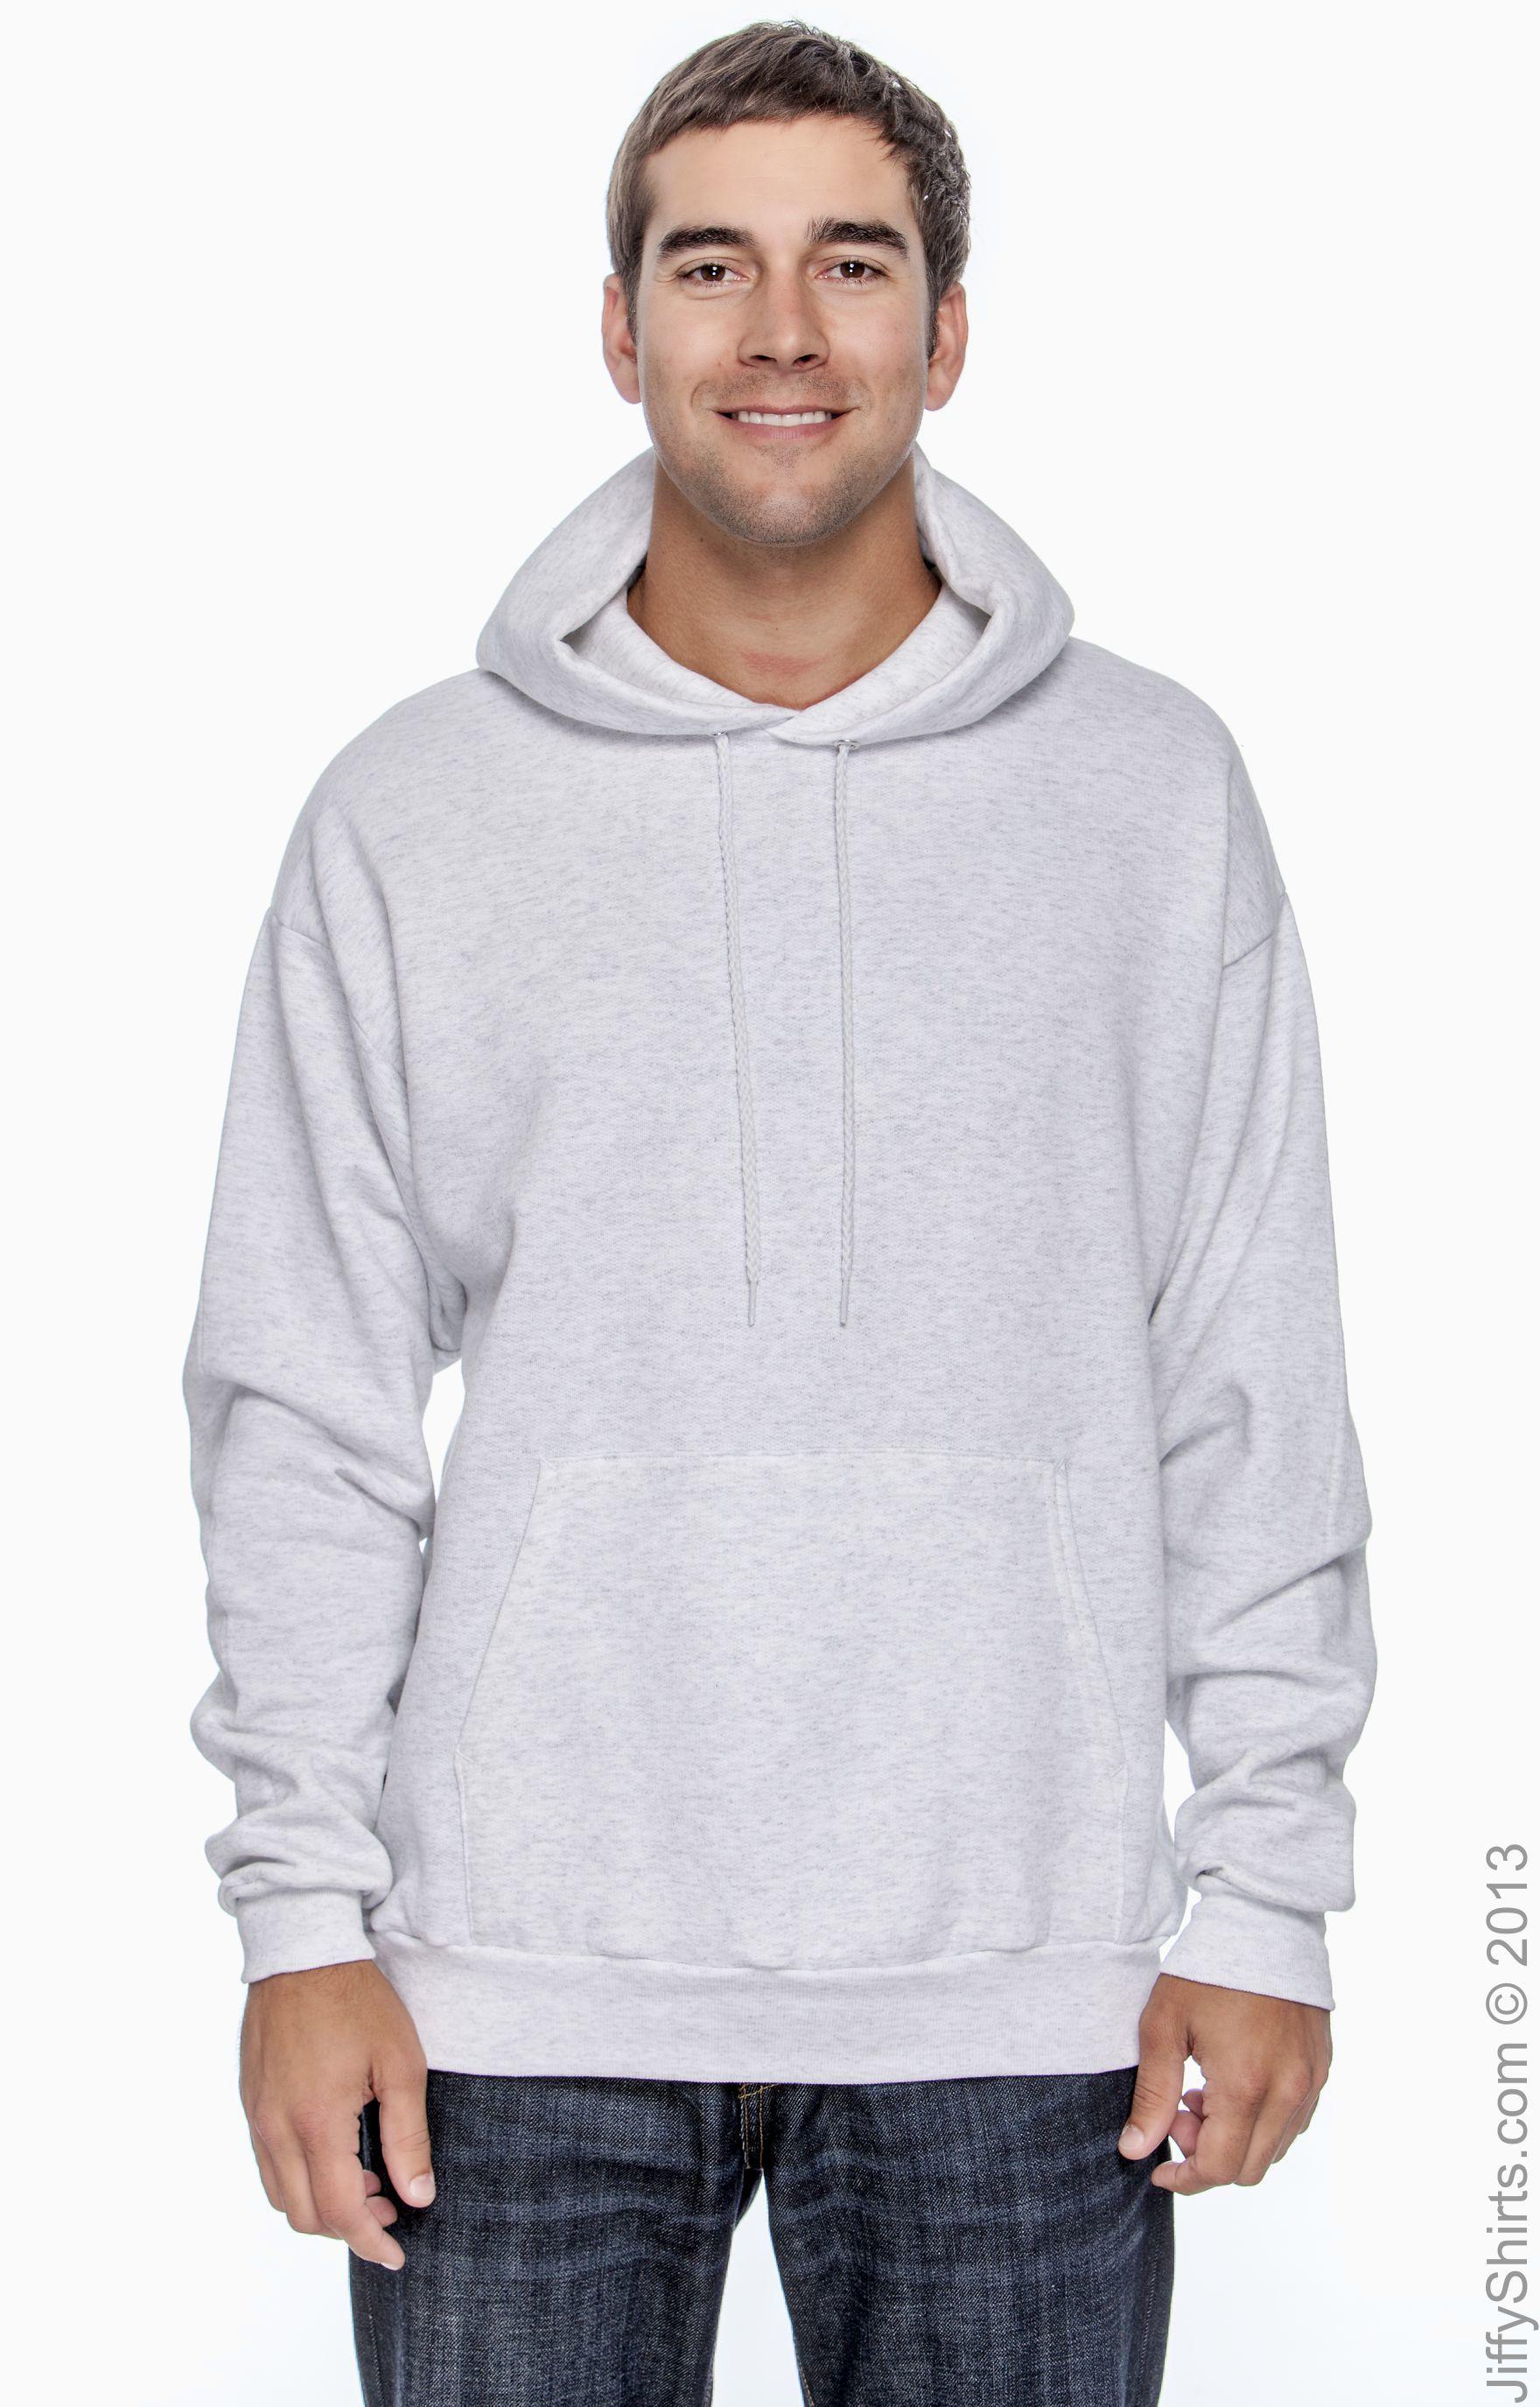 1 Pale Pink Hanes P170 Mens EcoSmart Hooded Sweatshirt XL 1 Orange